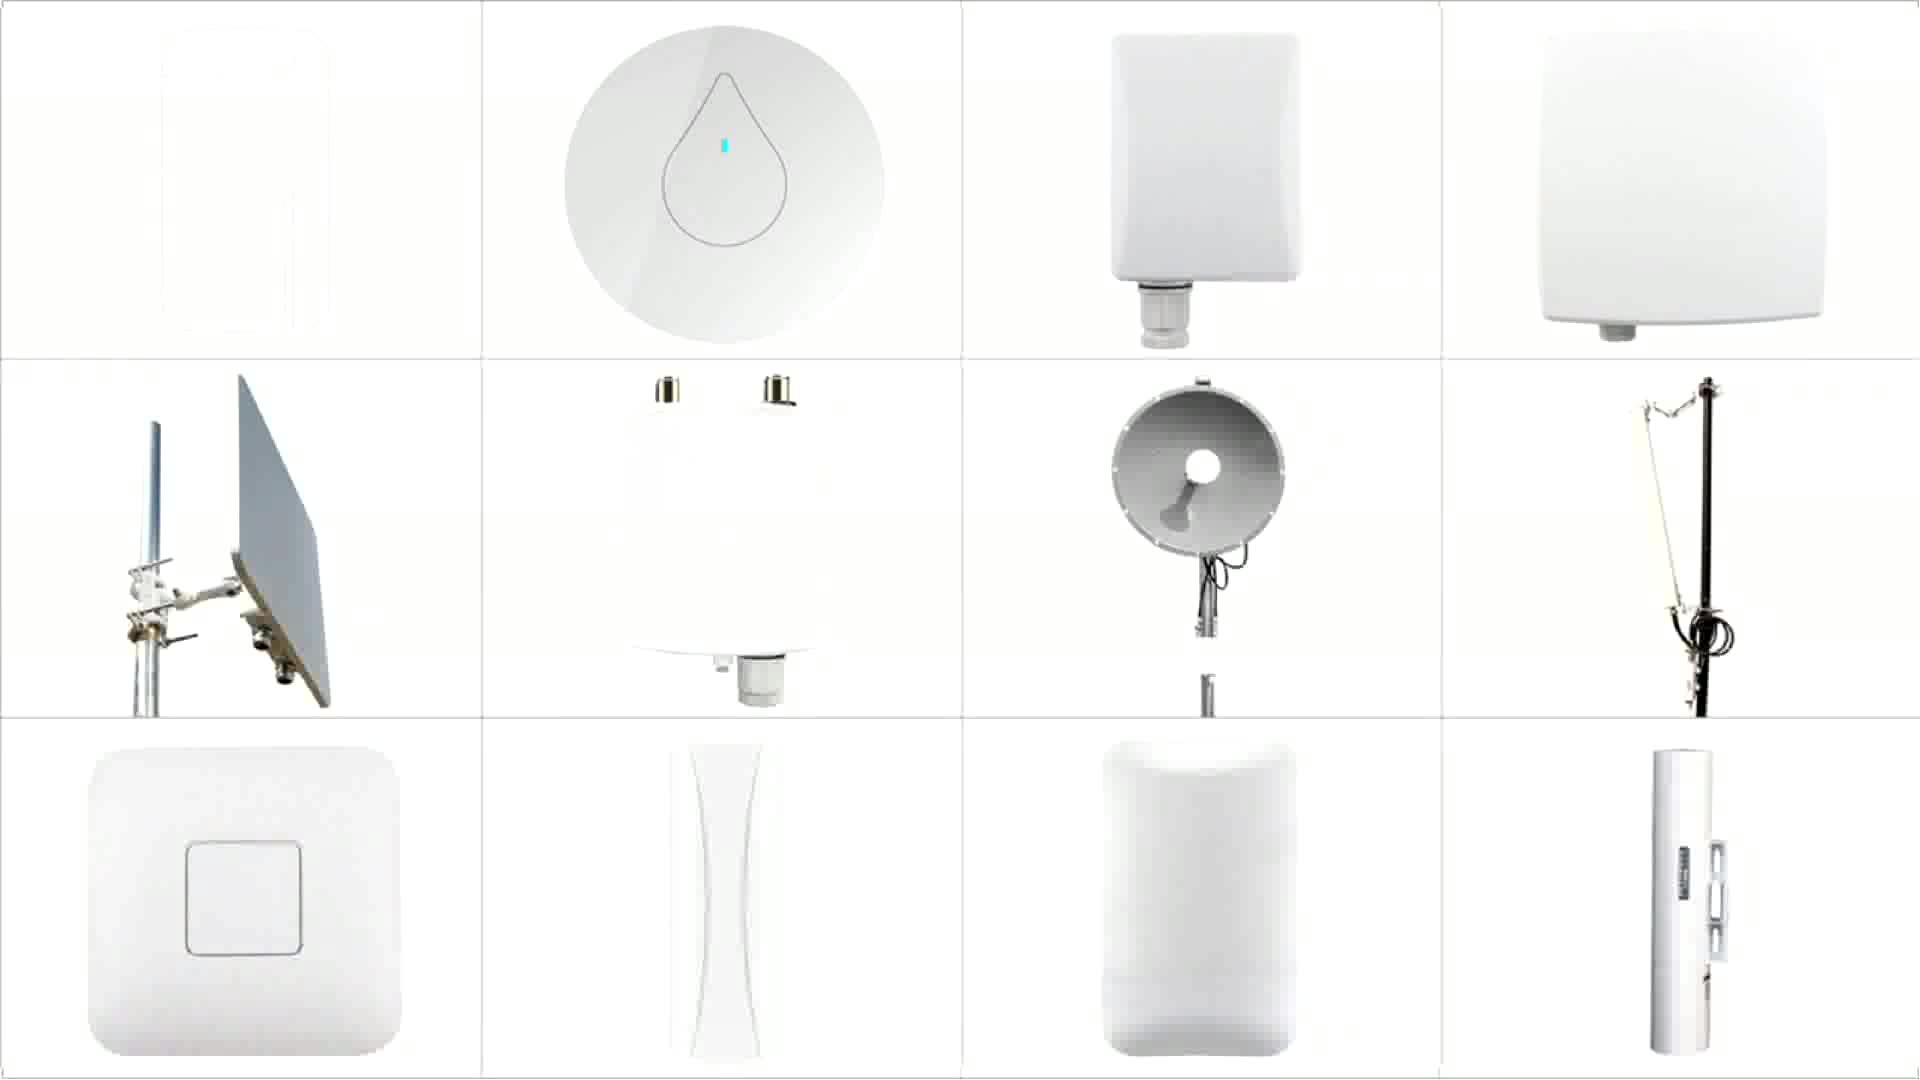 8CH 2MP cctv wireless camera system wireless cctv kit security camera long range